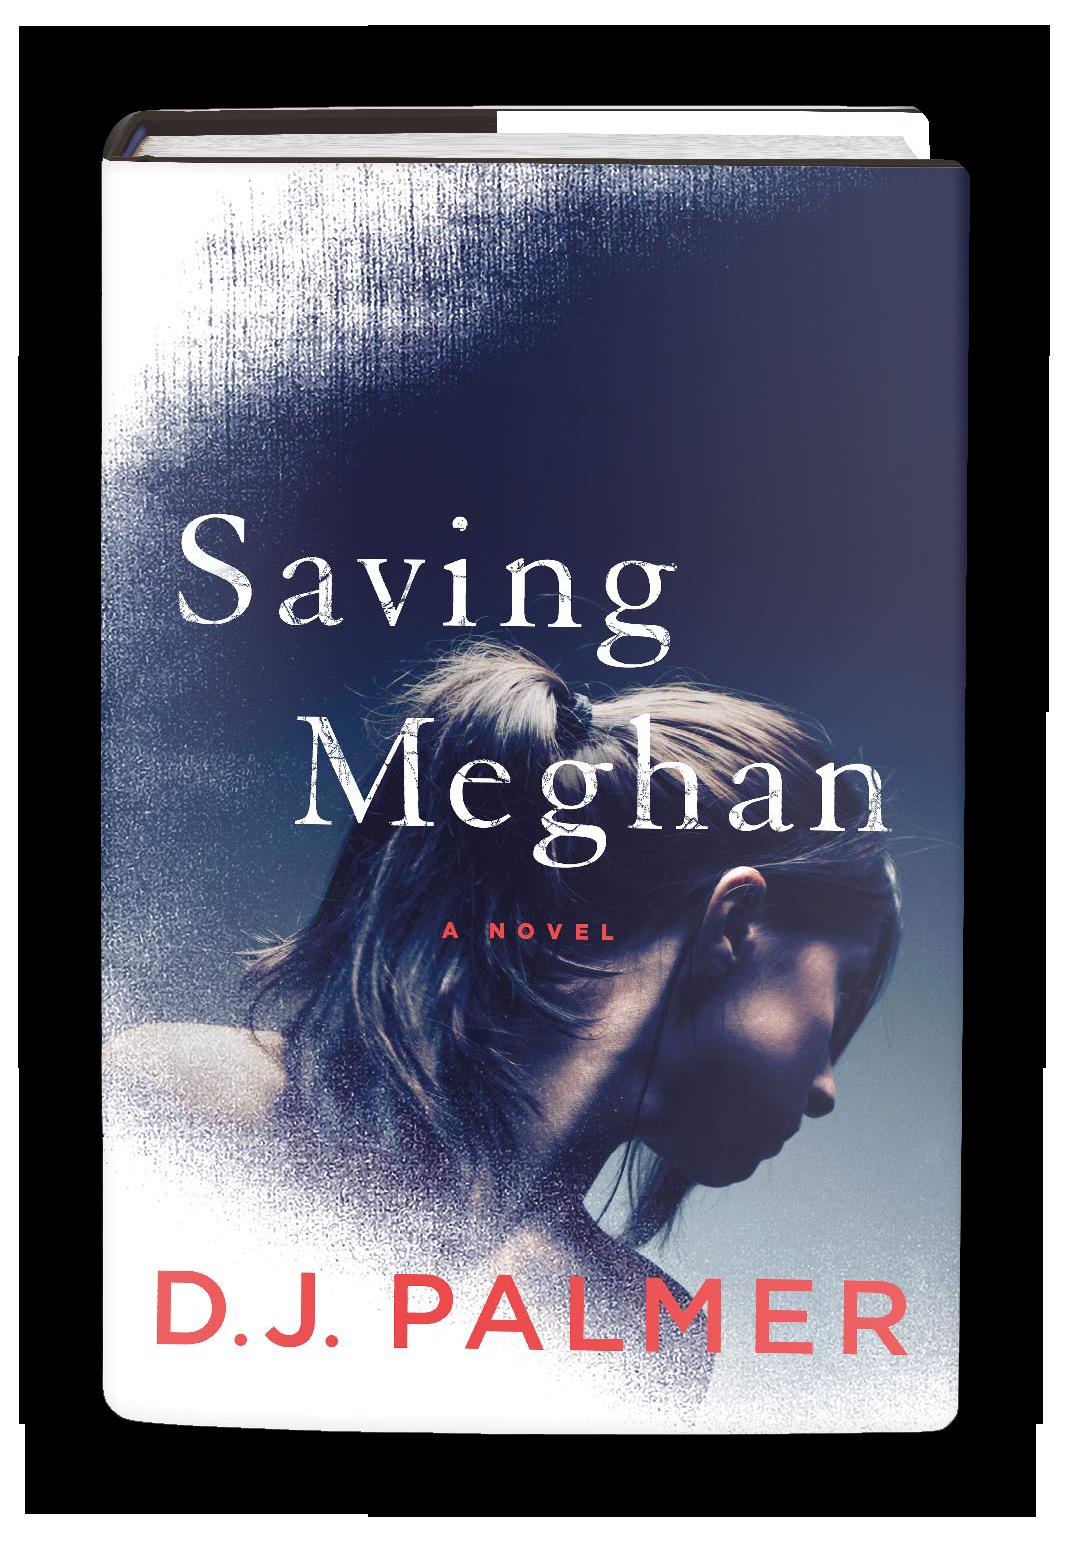 Saving_Meghan_Bookshot.png